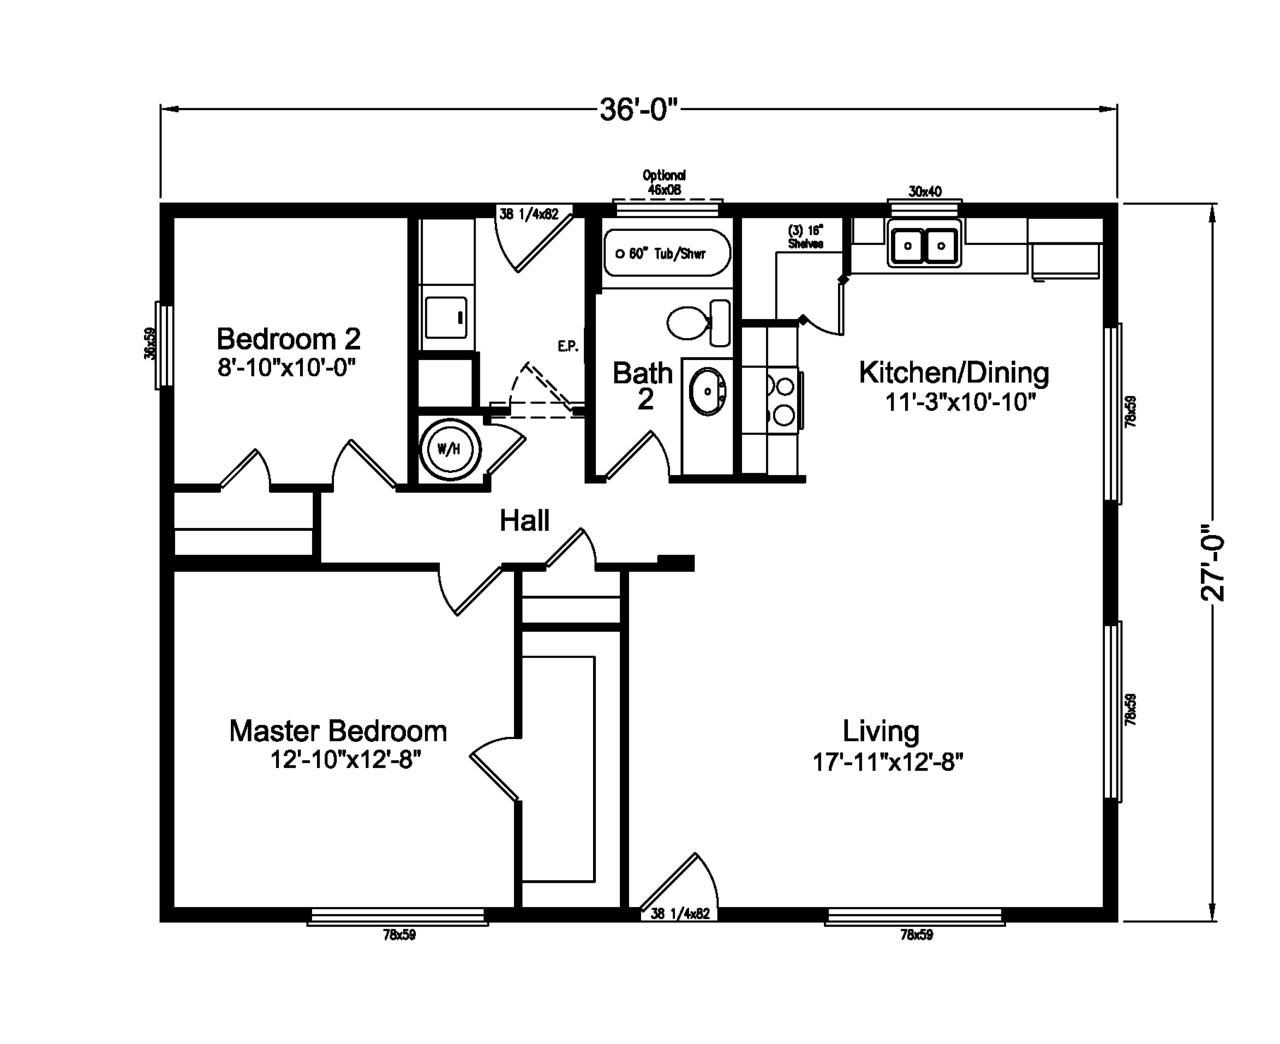 04844ffc1812e7adaa0c67866a024e11 Palm Harbor Manufactured Home Floor Plan on